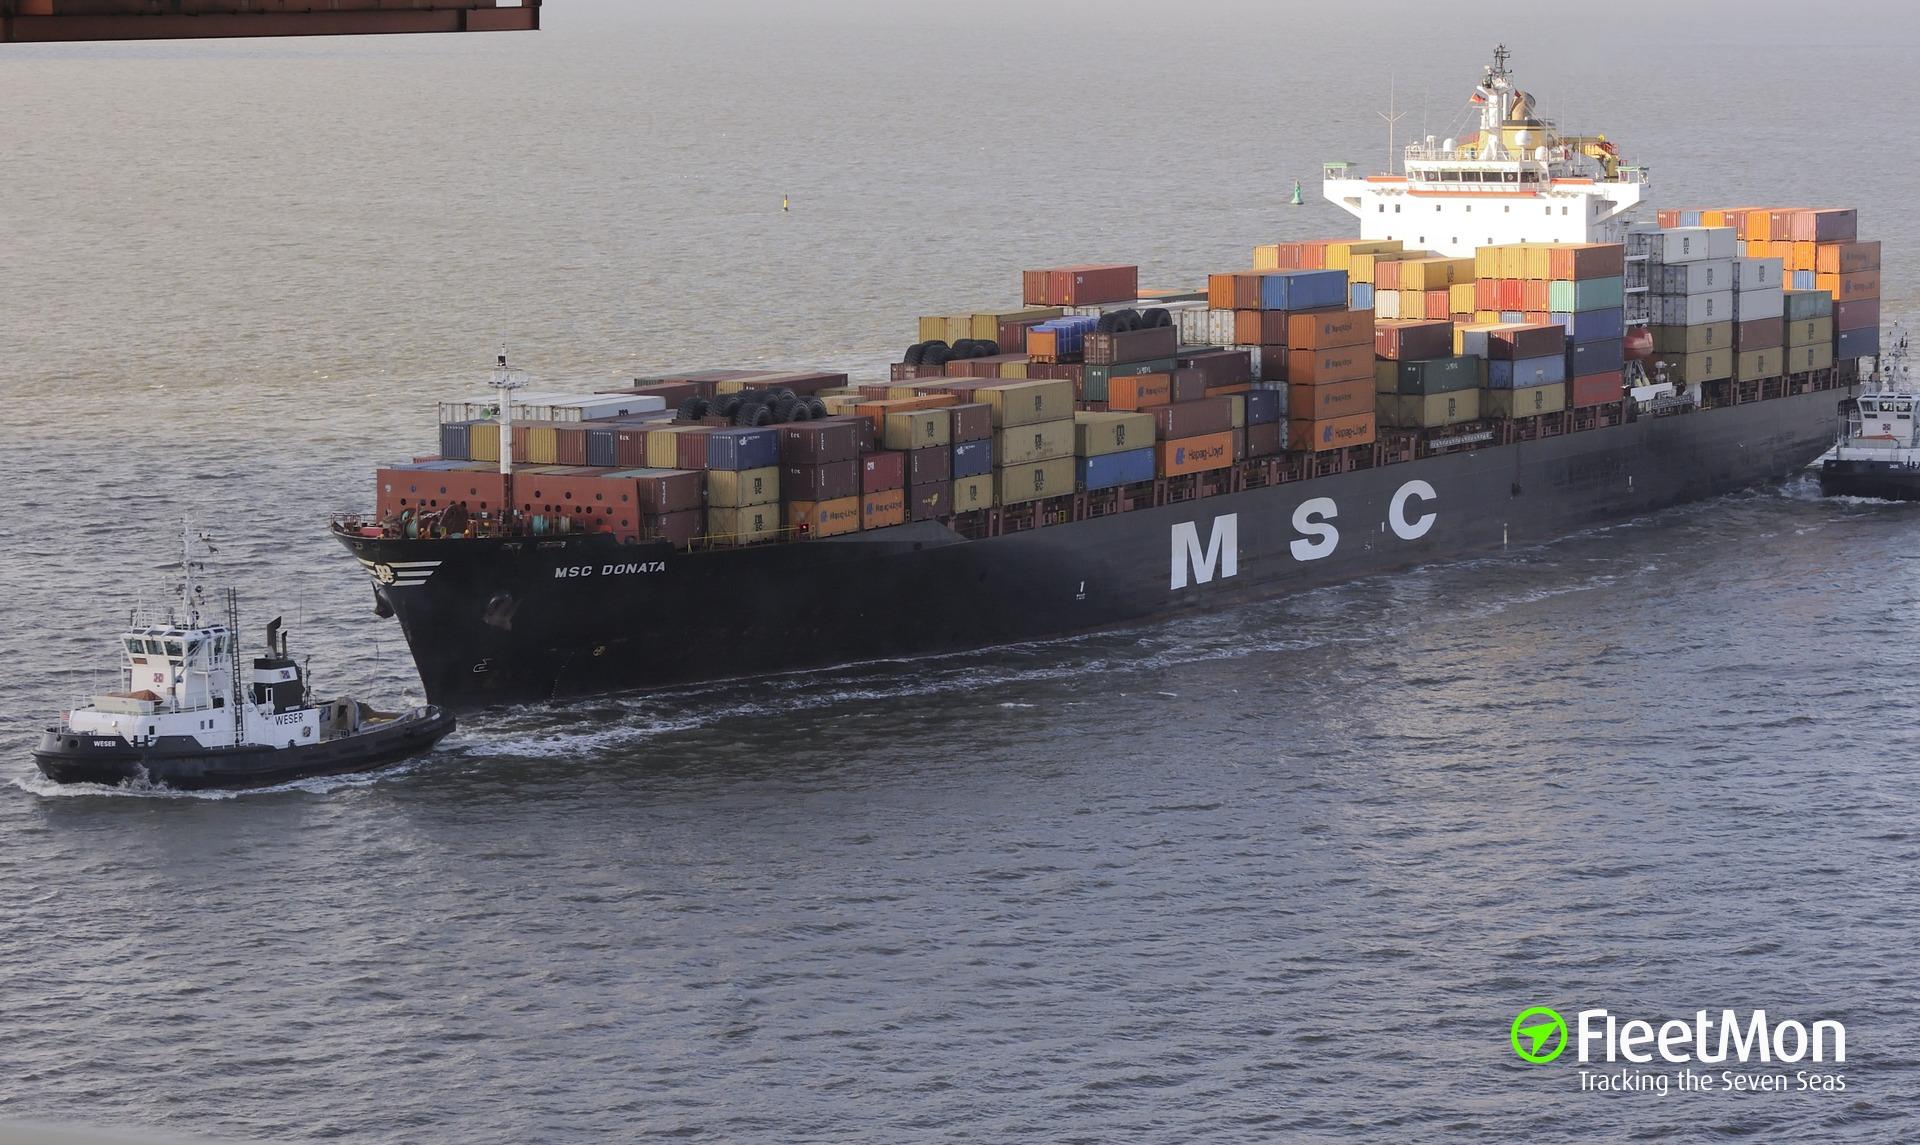 Container ships collision: IAPETOS vs. MSC DONATA